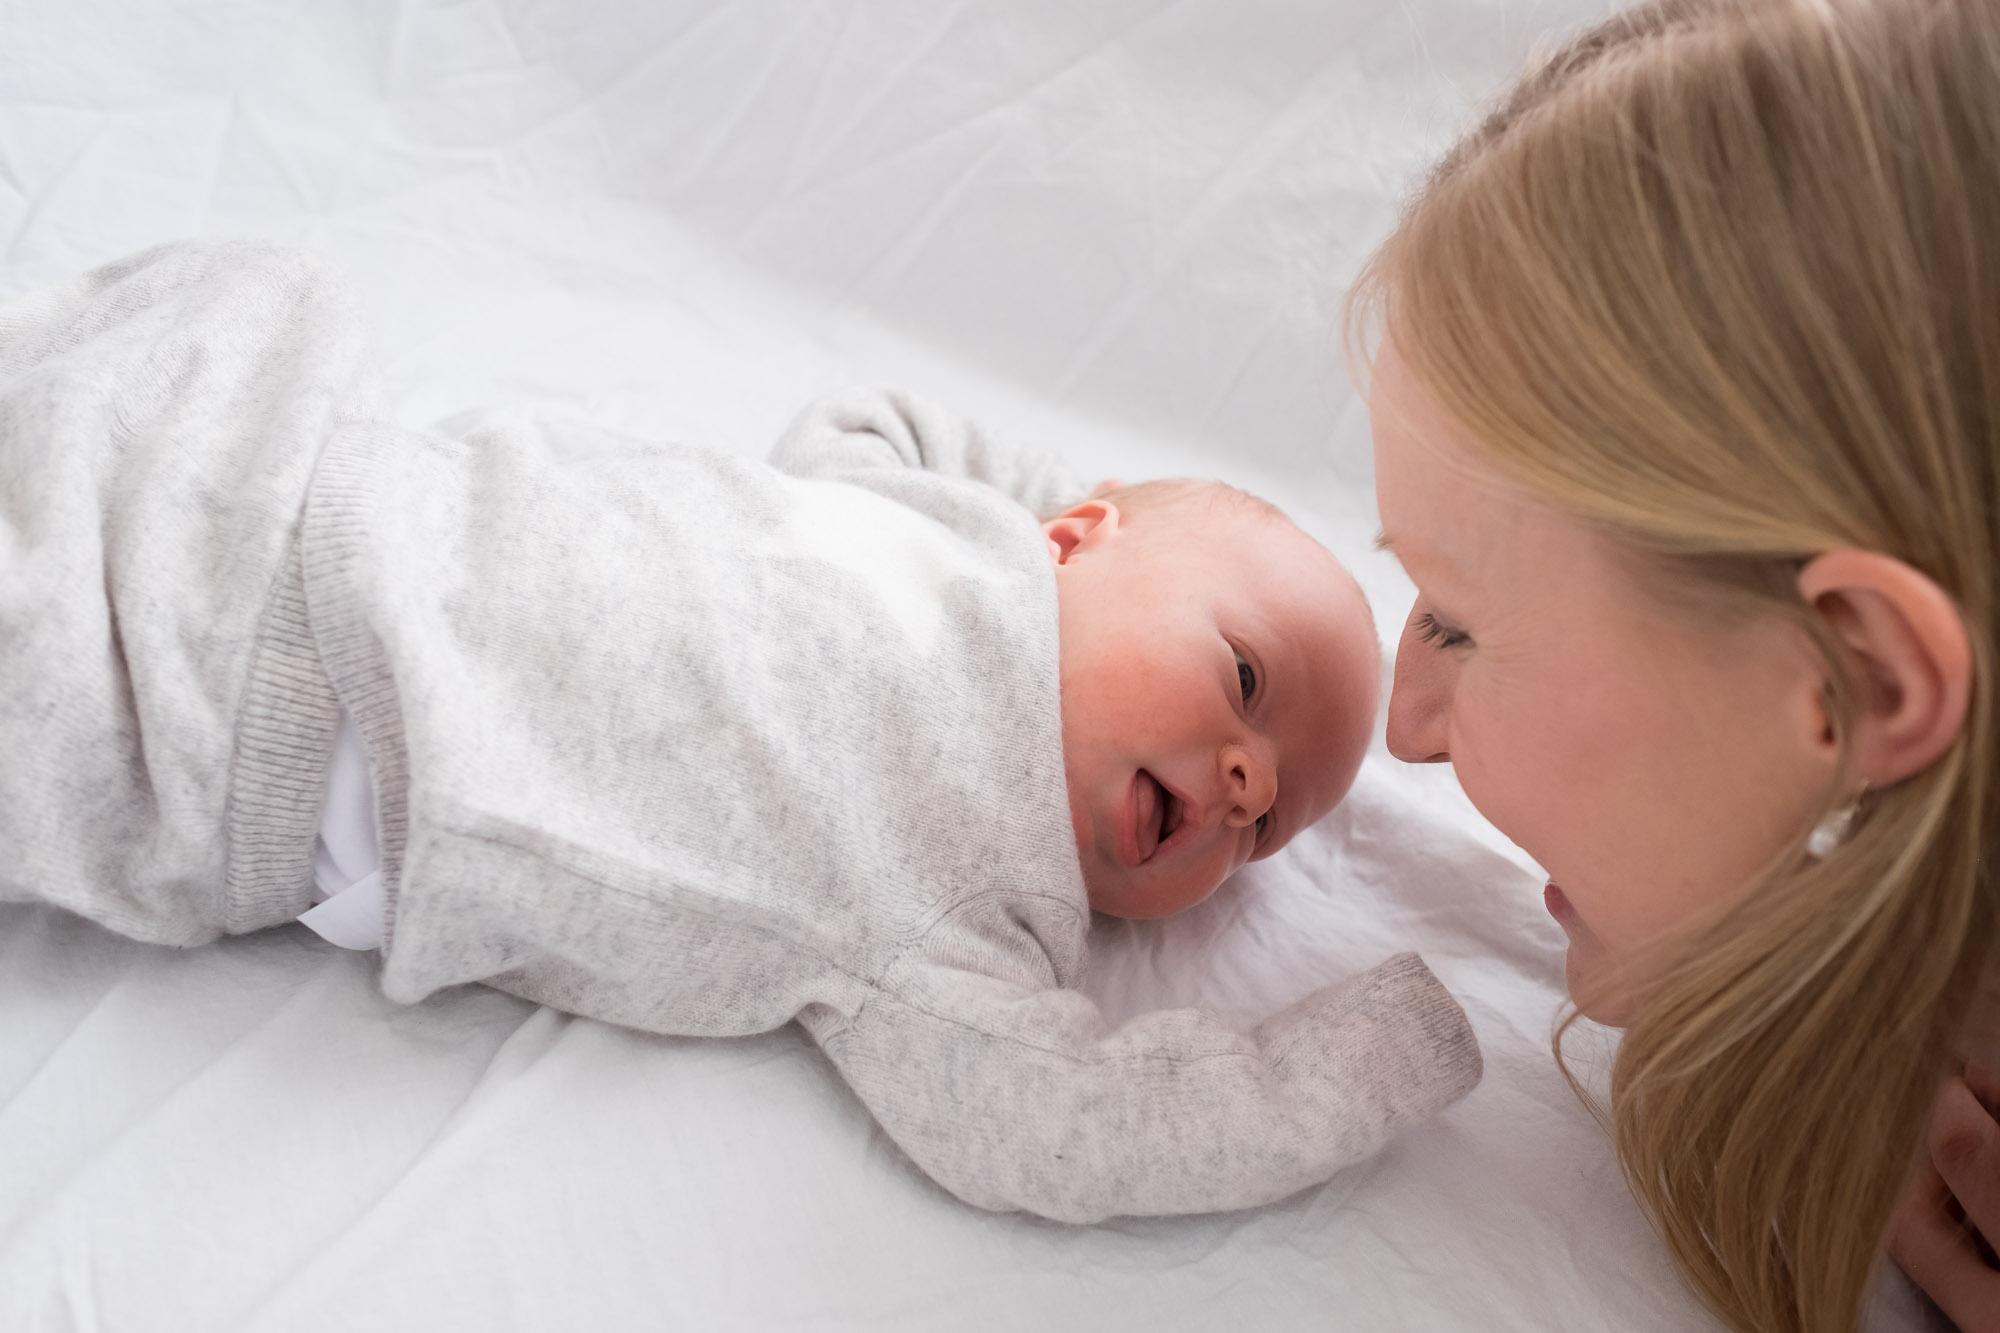 family-portrait-baby-photographer-159.jpg